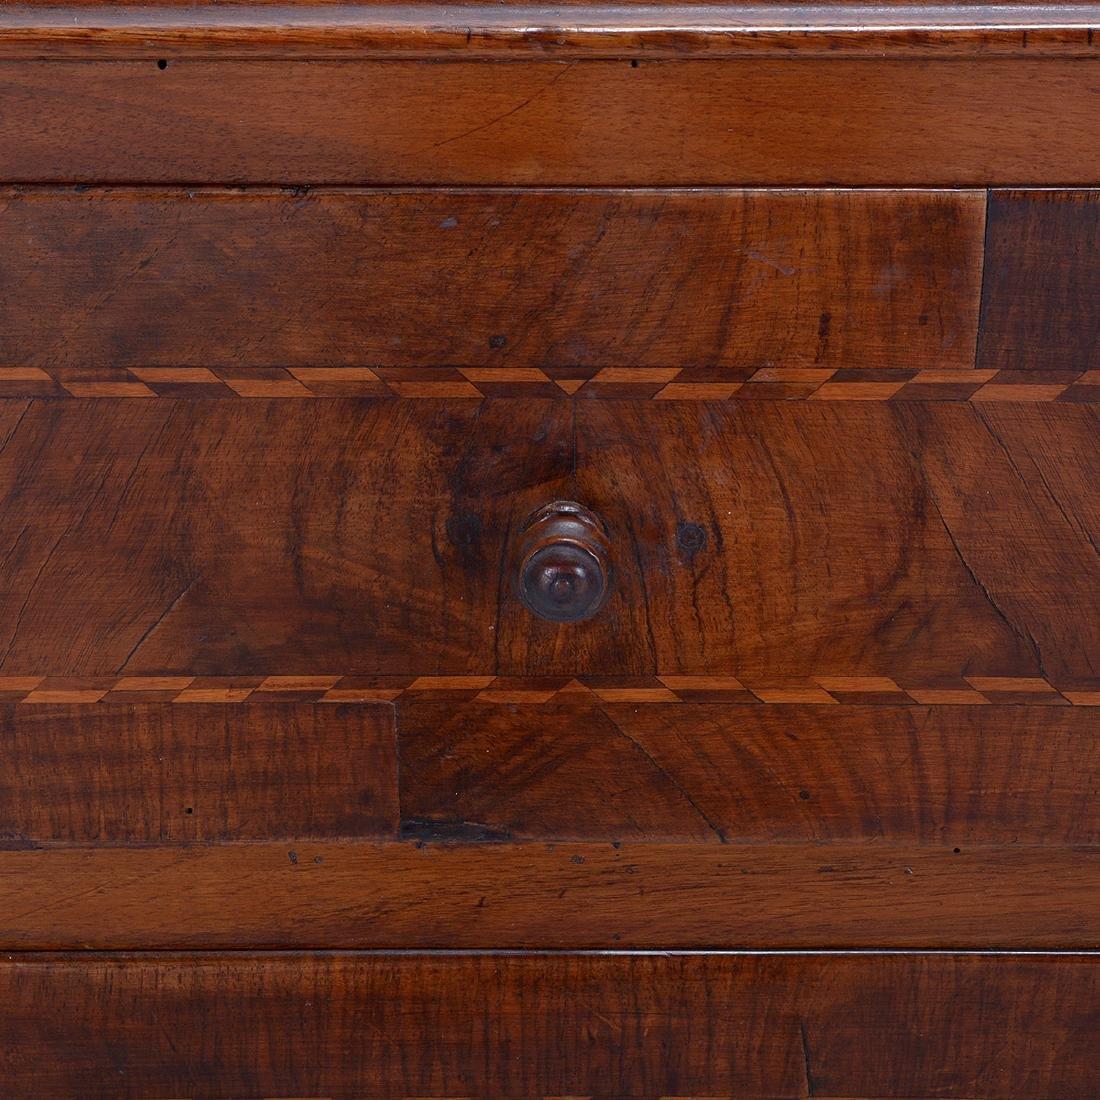 North Italian Neoclassical Inlaid Walnut Cabinet, Late - 3